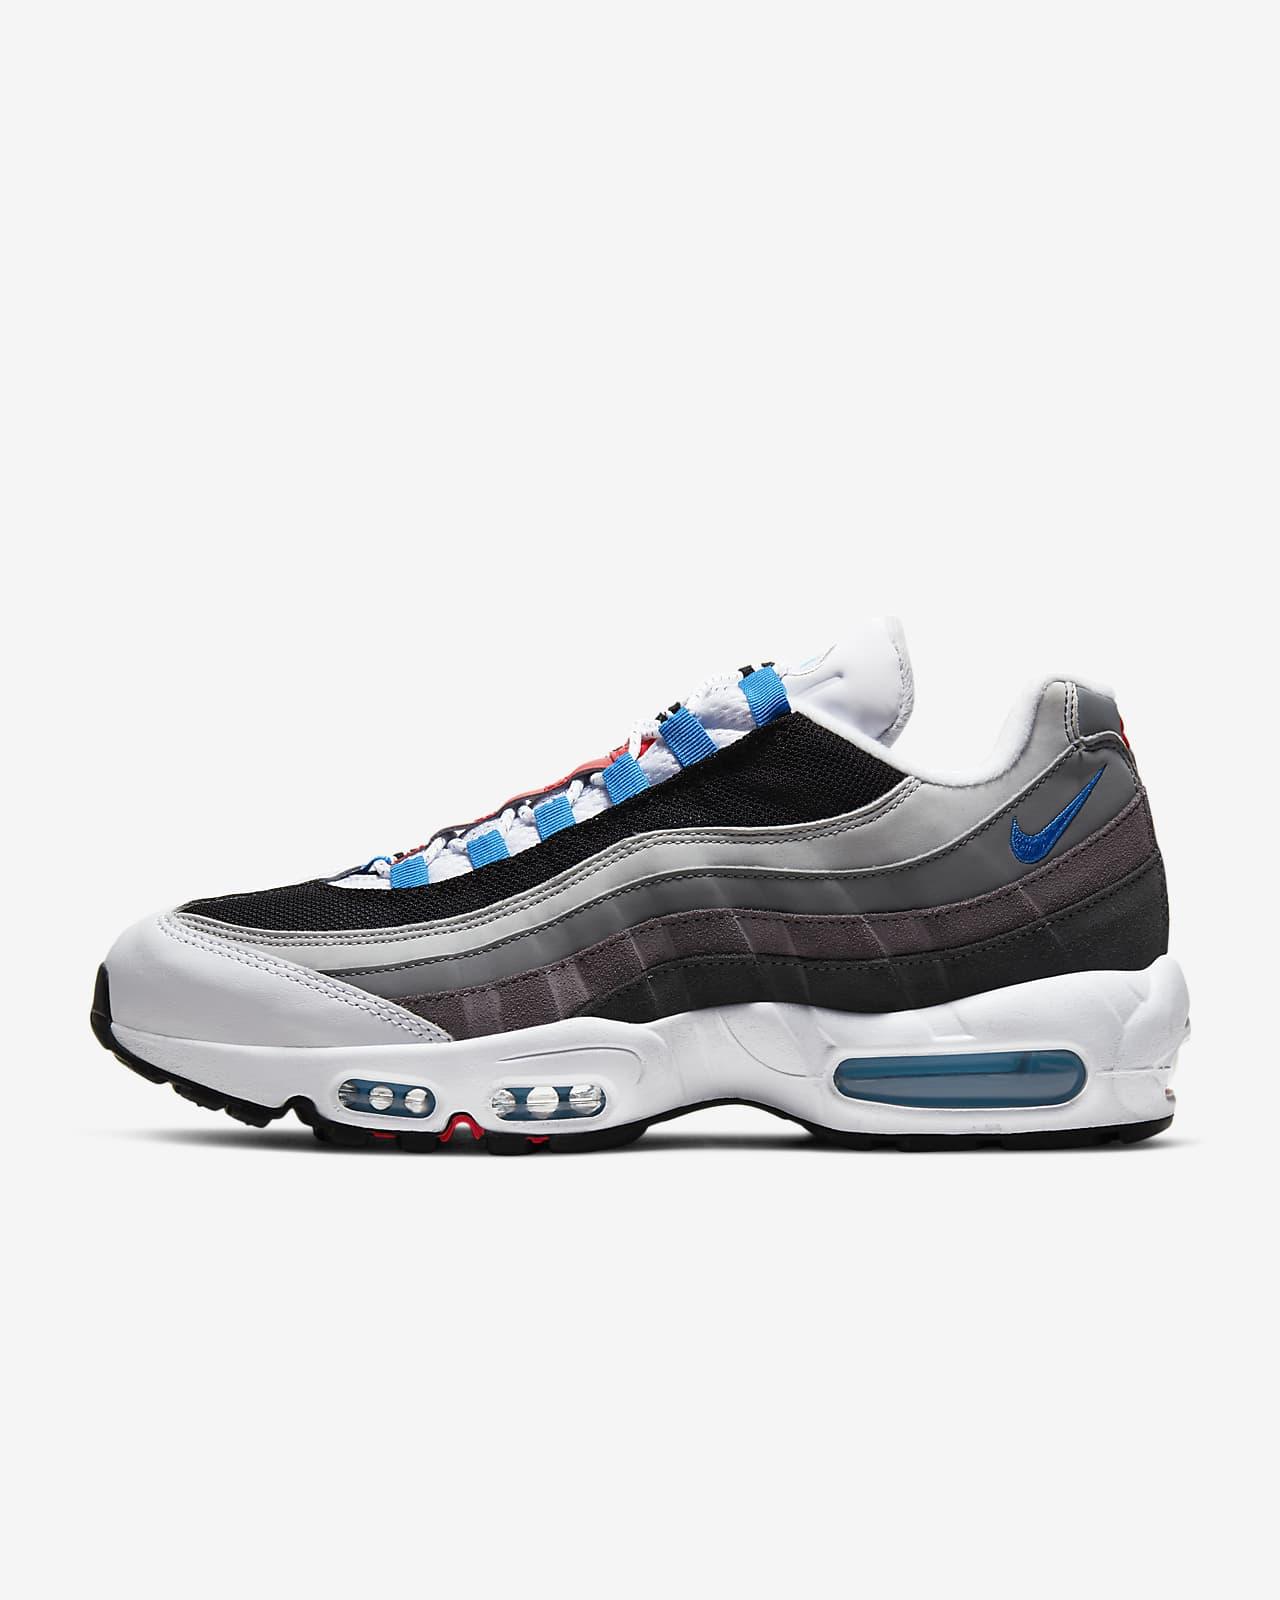 Nike Air Max 95 Men's Shoe. Nike SG